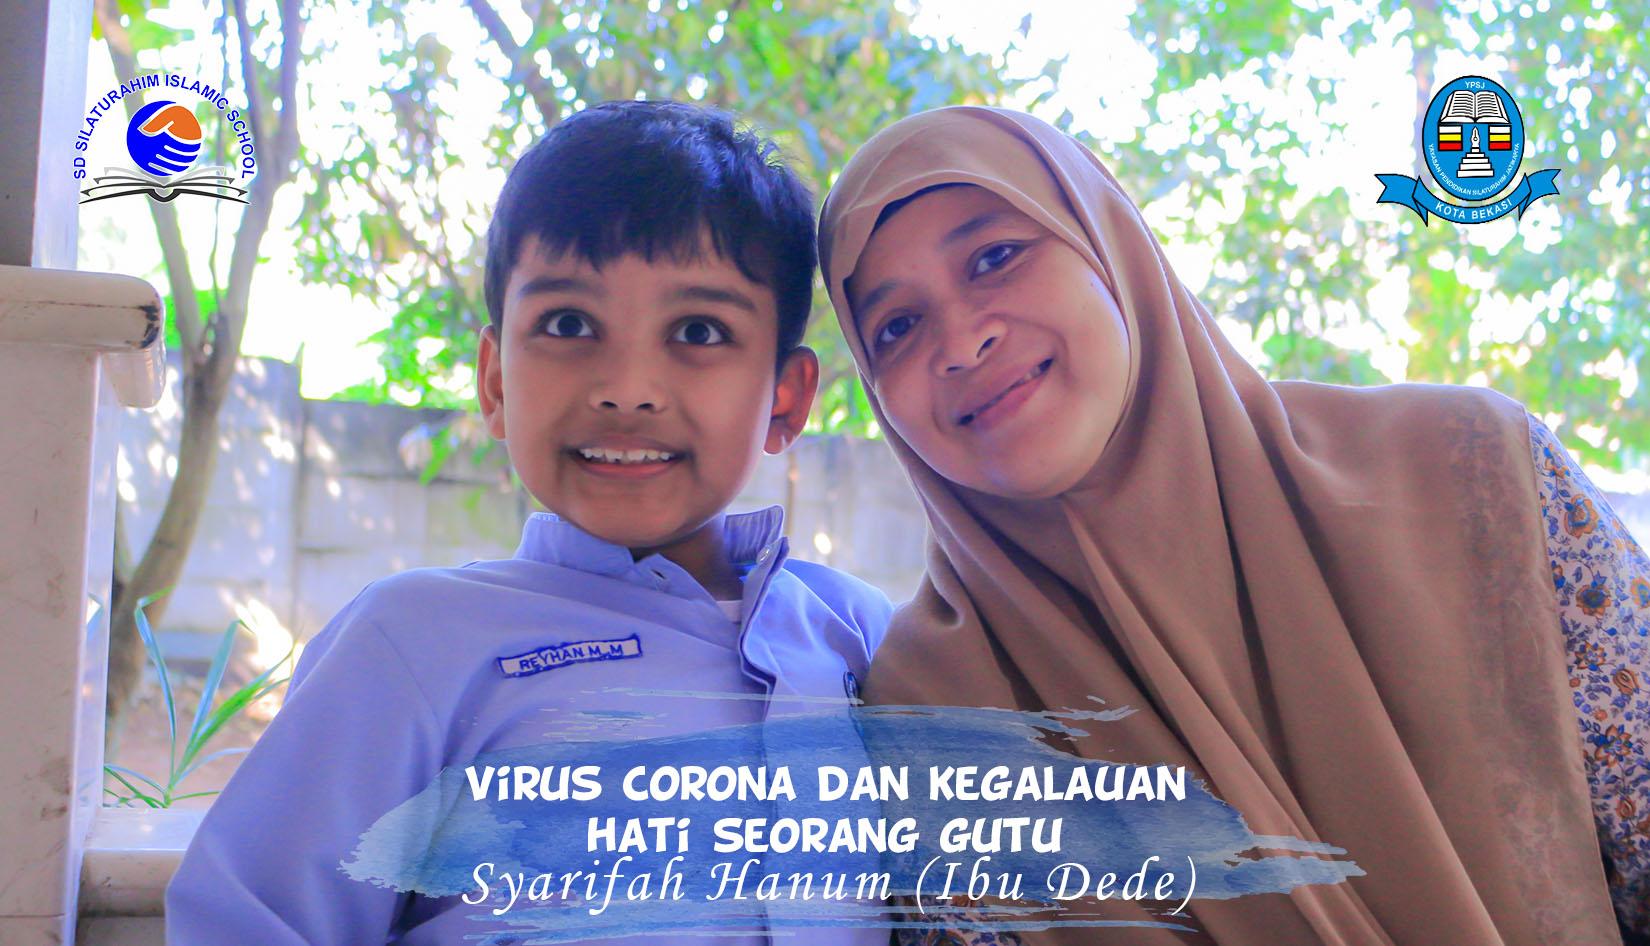 Read more about the article VIRUS CORONA DAN KEGALAUAN HATI SEORANG GURU